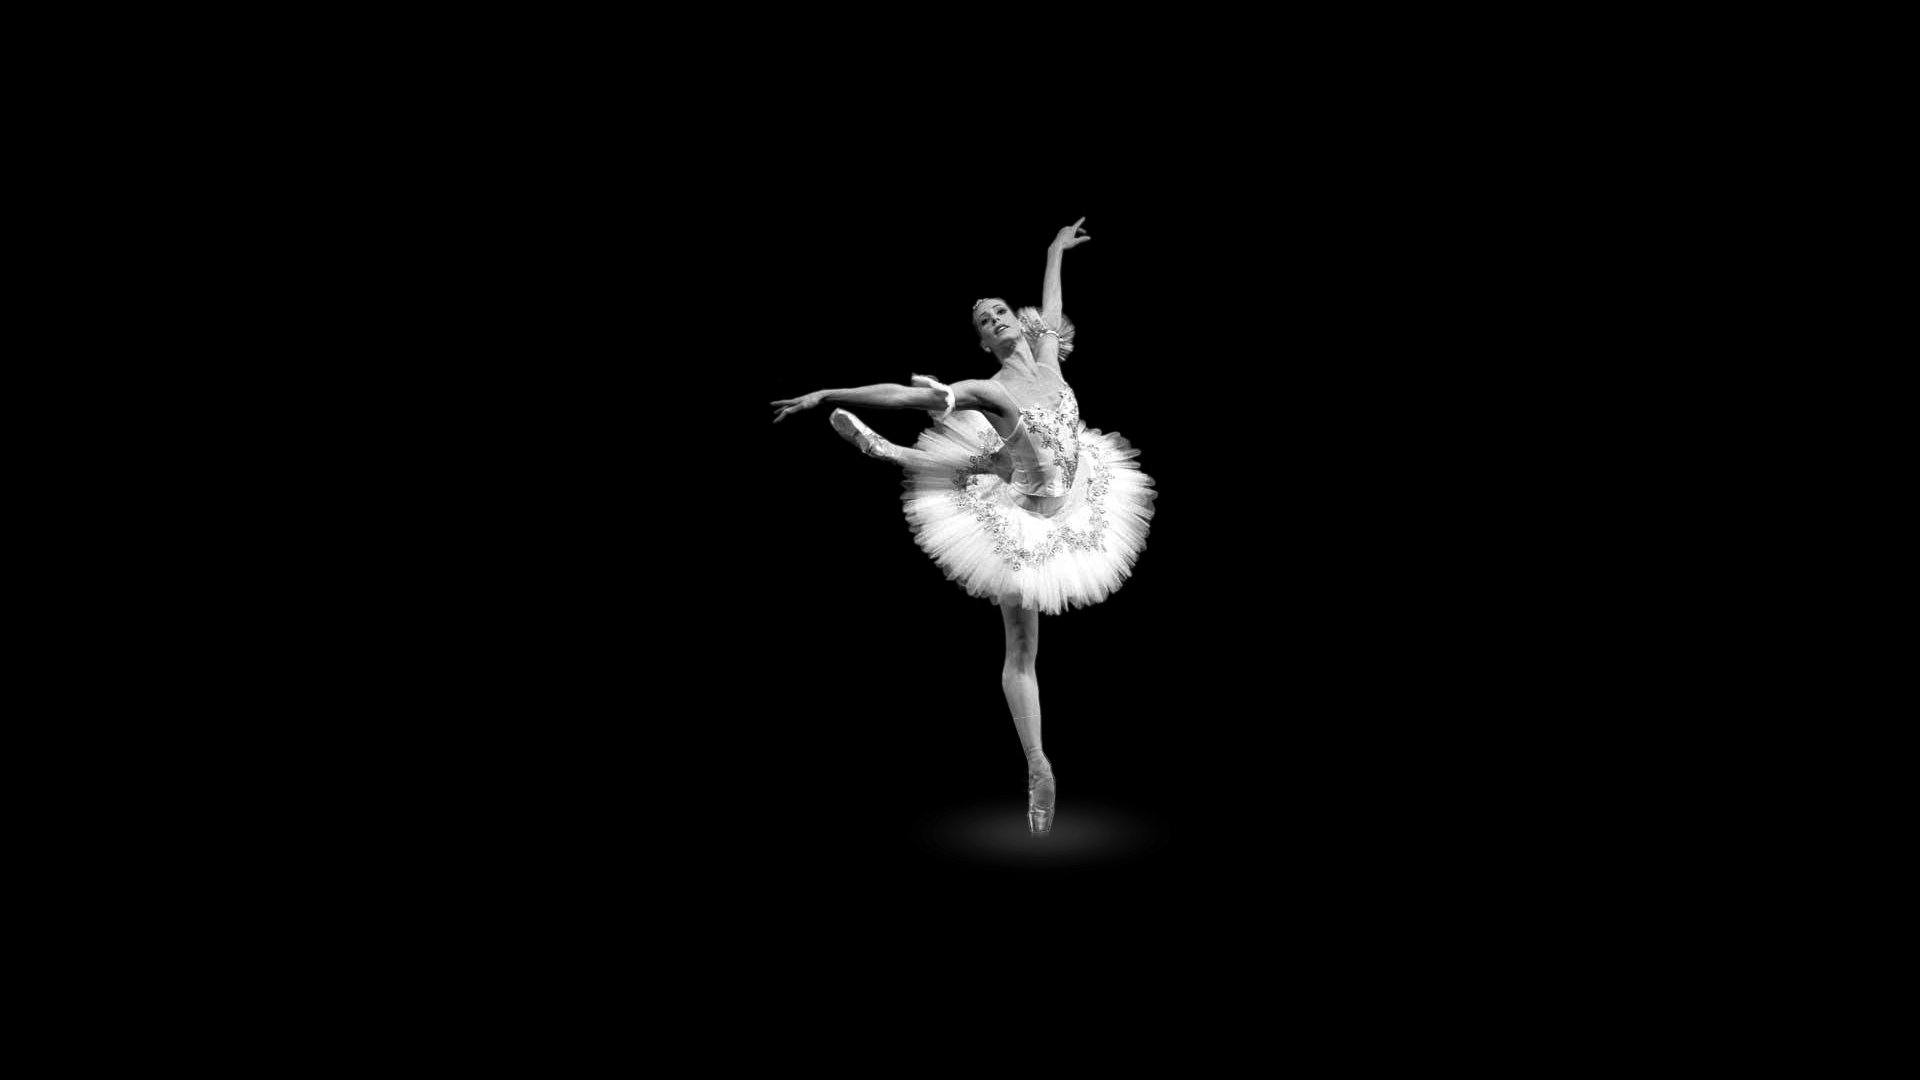 Ballet Dancer Wallpapers HD - Wallpaper Cave